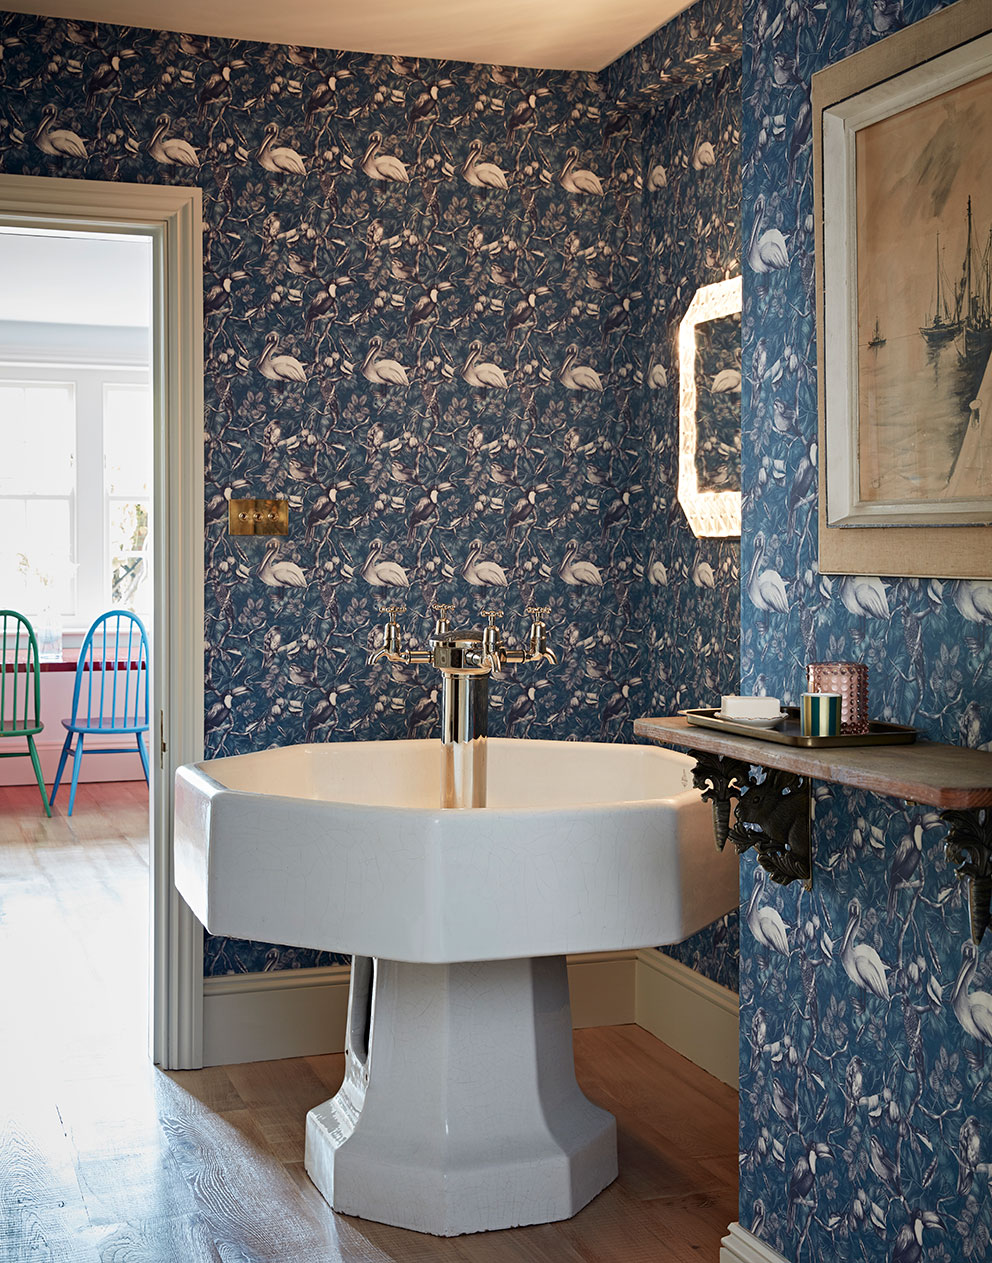 Unusual ceramic drinking fountain in corner of room with blue bird wallpaper